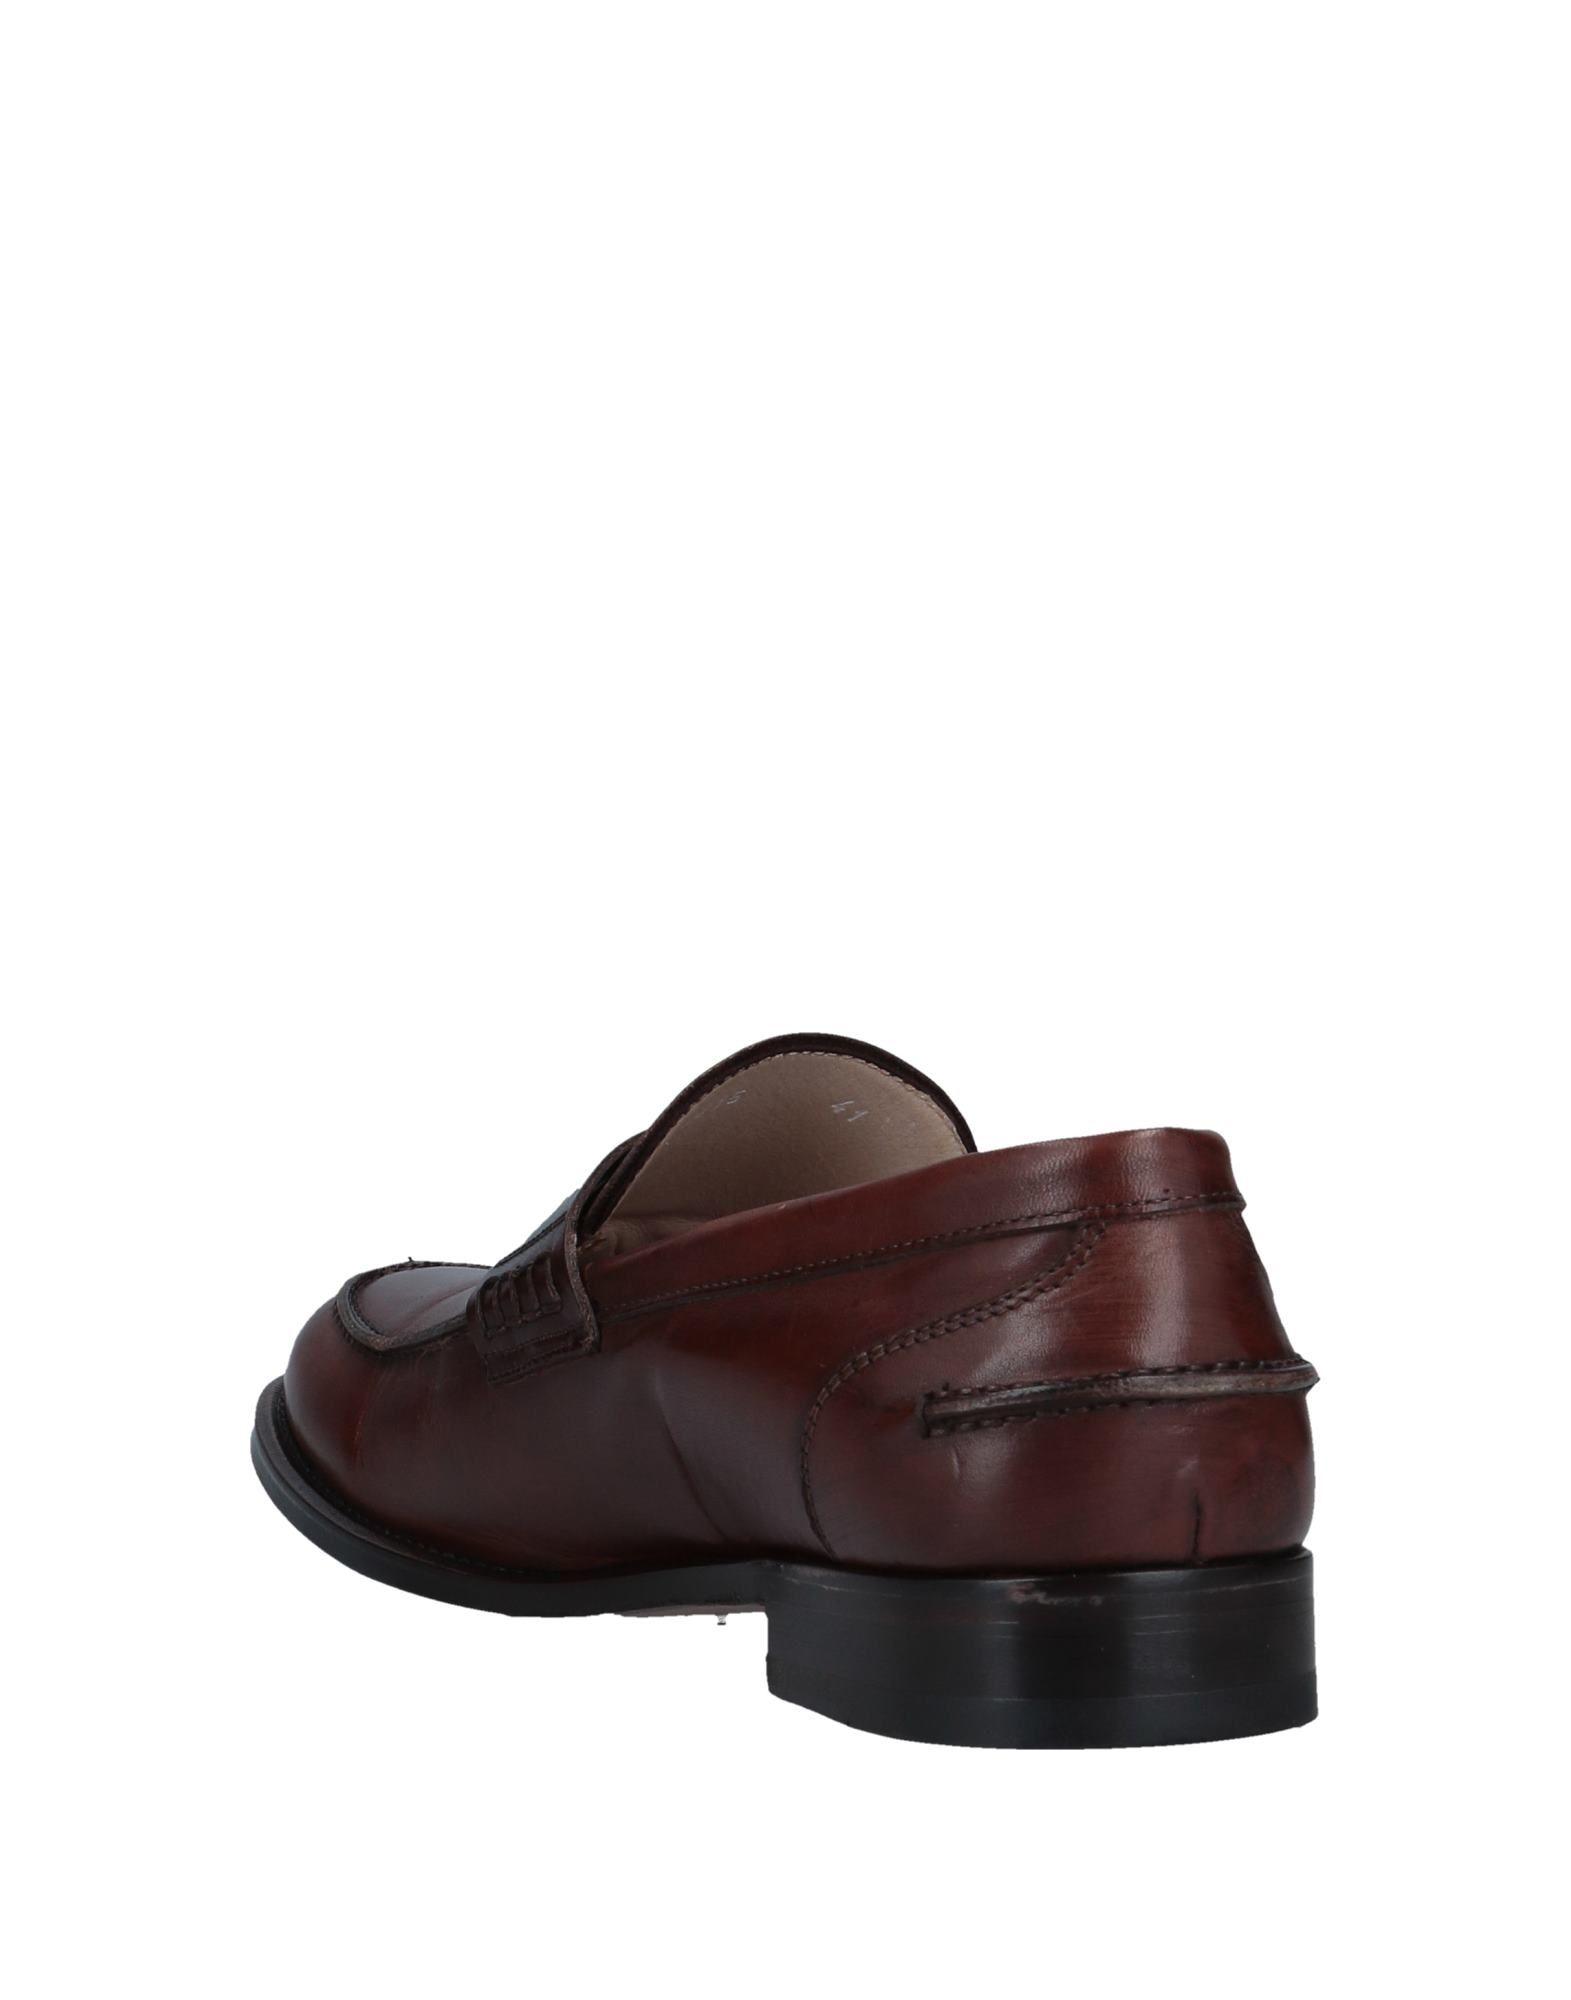 Baldinini Mokassins Qualität Herren  11554195UE Gute Qualität Mokassins beliebte Schuhe 87f9a1